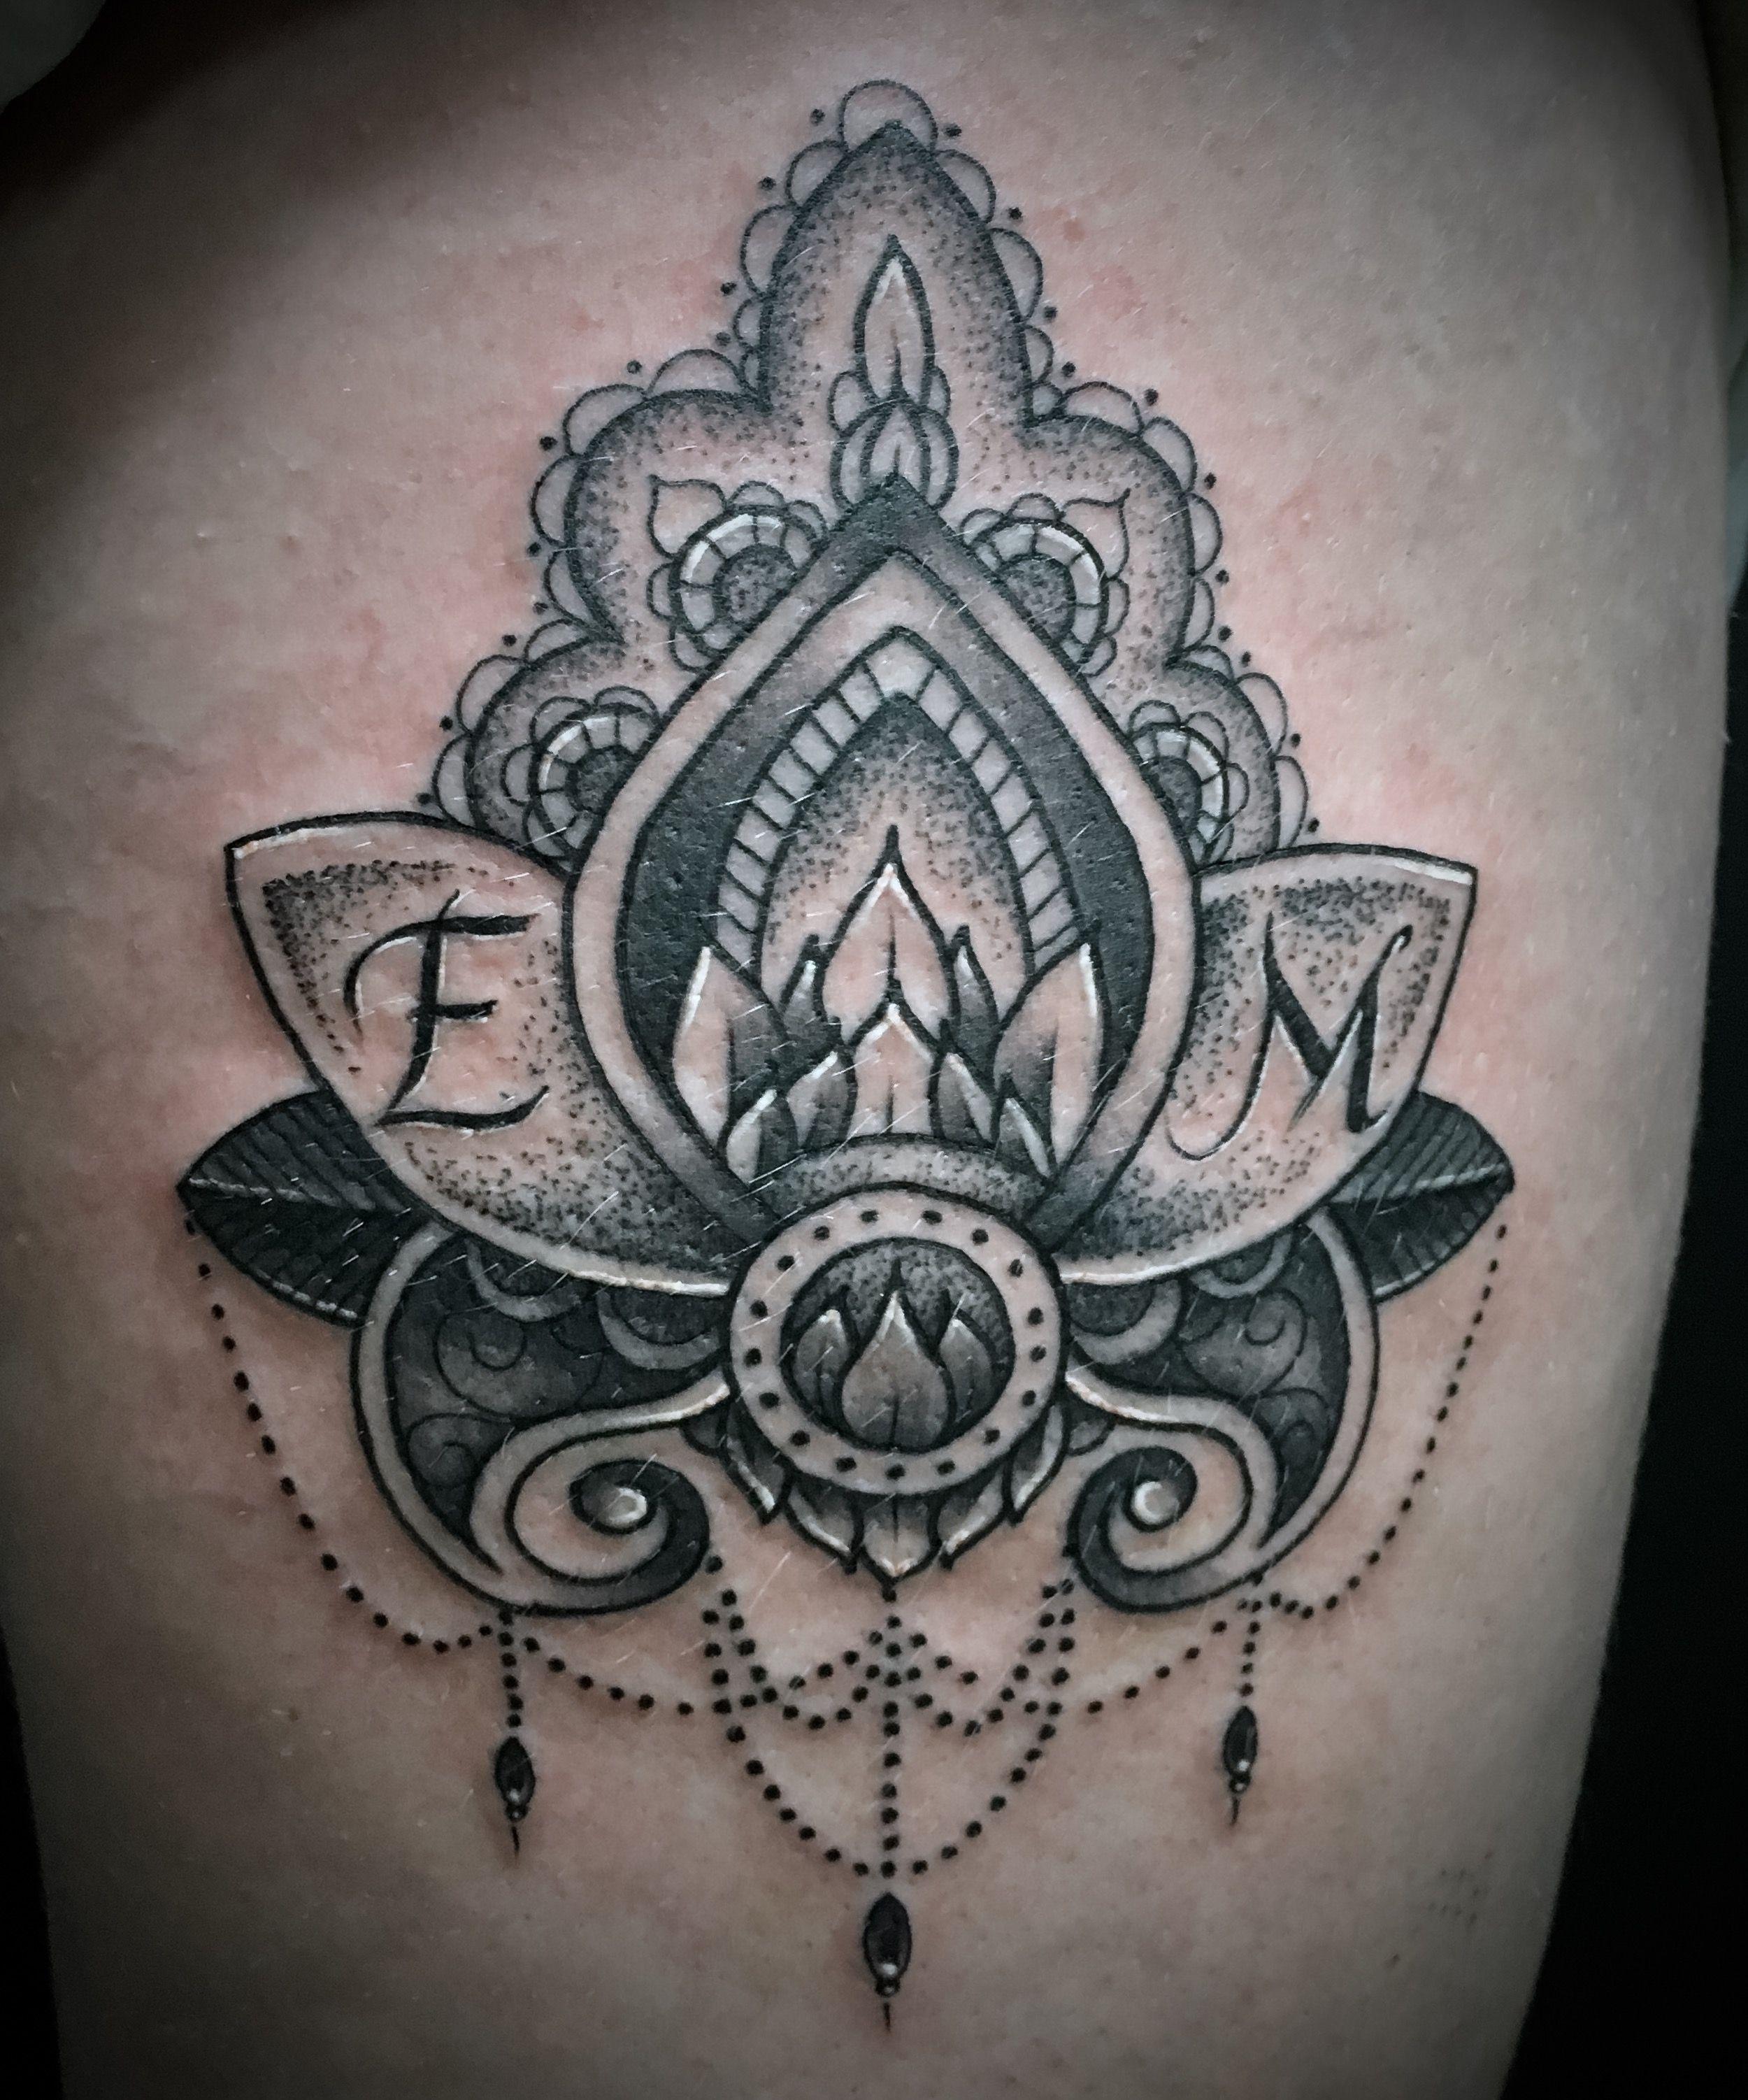 Mandala style lotus thigh tattoo tattoos pinterest tattoo mandala style lotus thigh tattoo izmirmasajfo